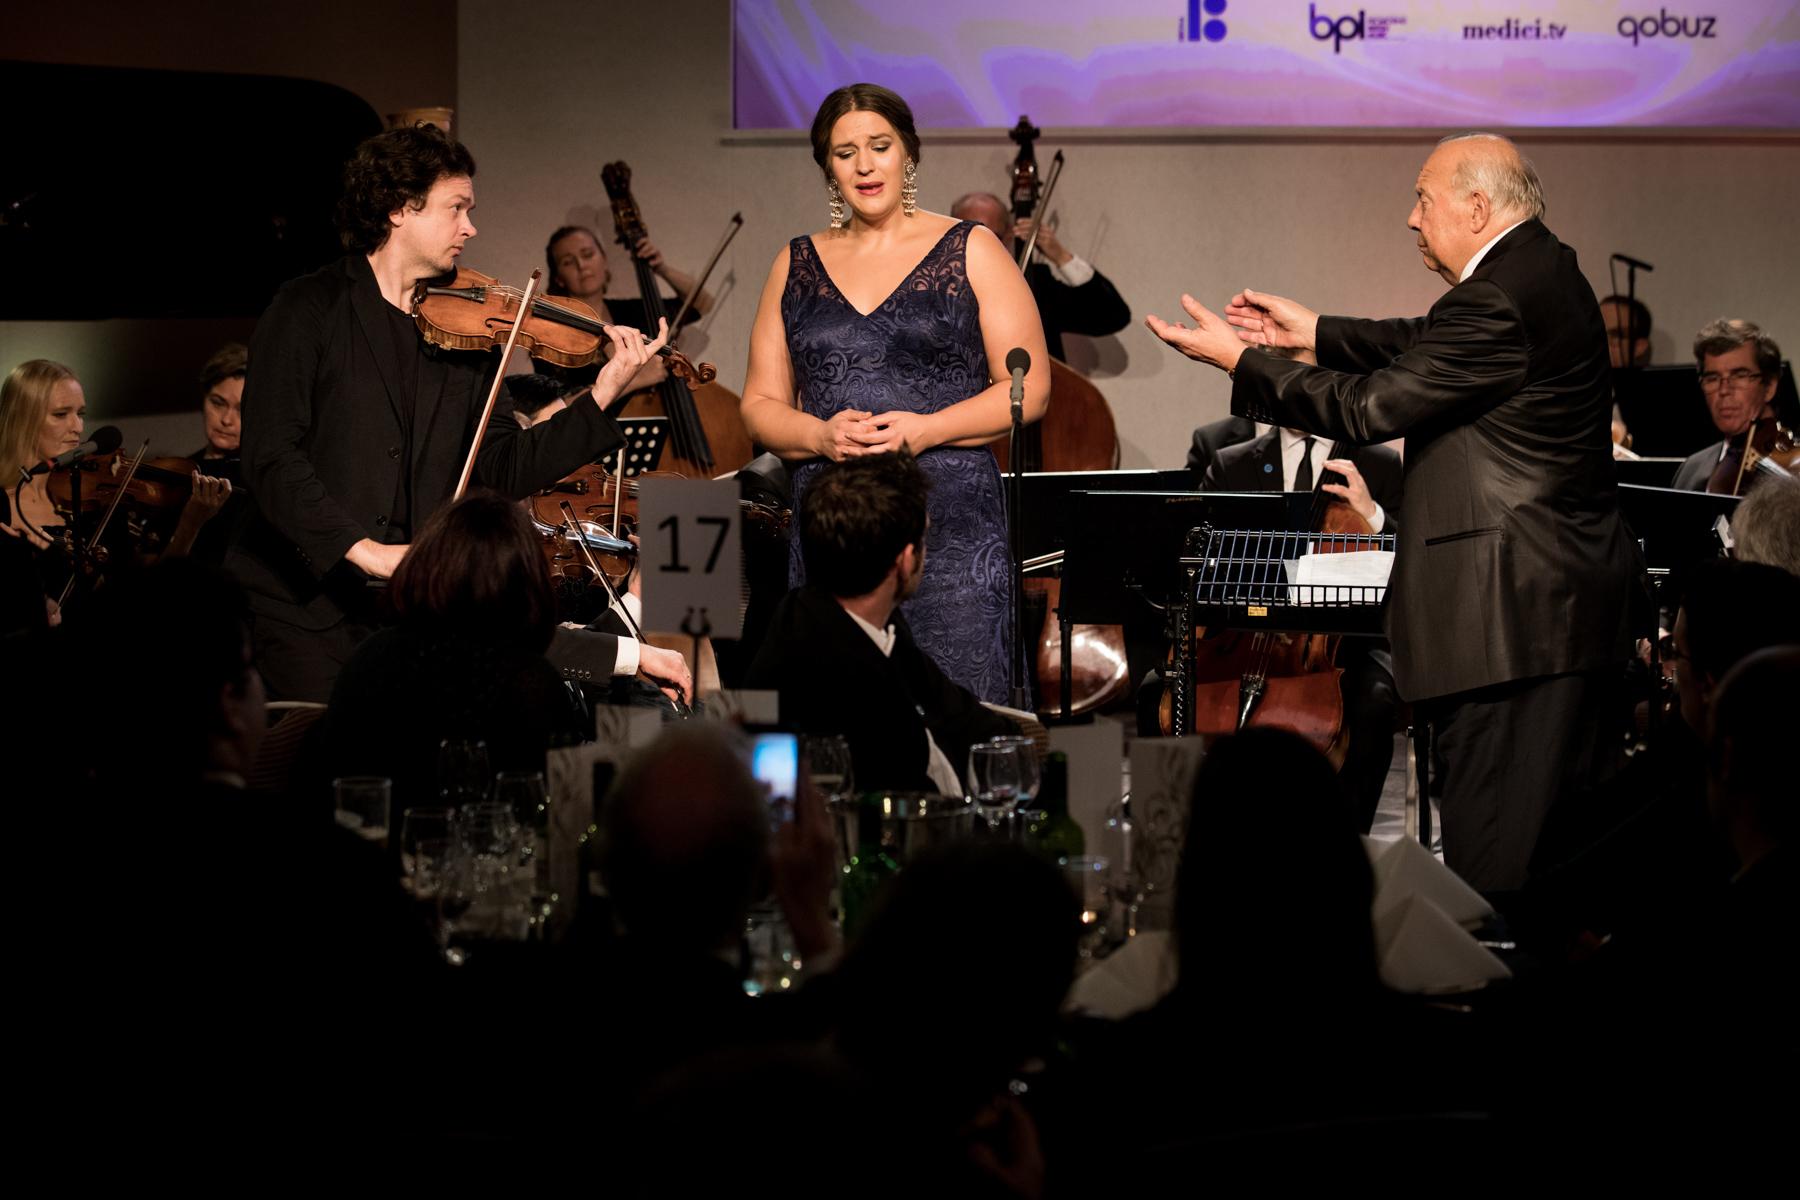 Marek Zwiebel, Lise Davidsen and Neeme Järvi perform Strauss's 'Morgen' to close the show